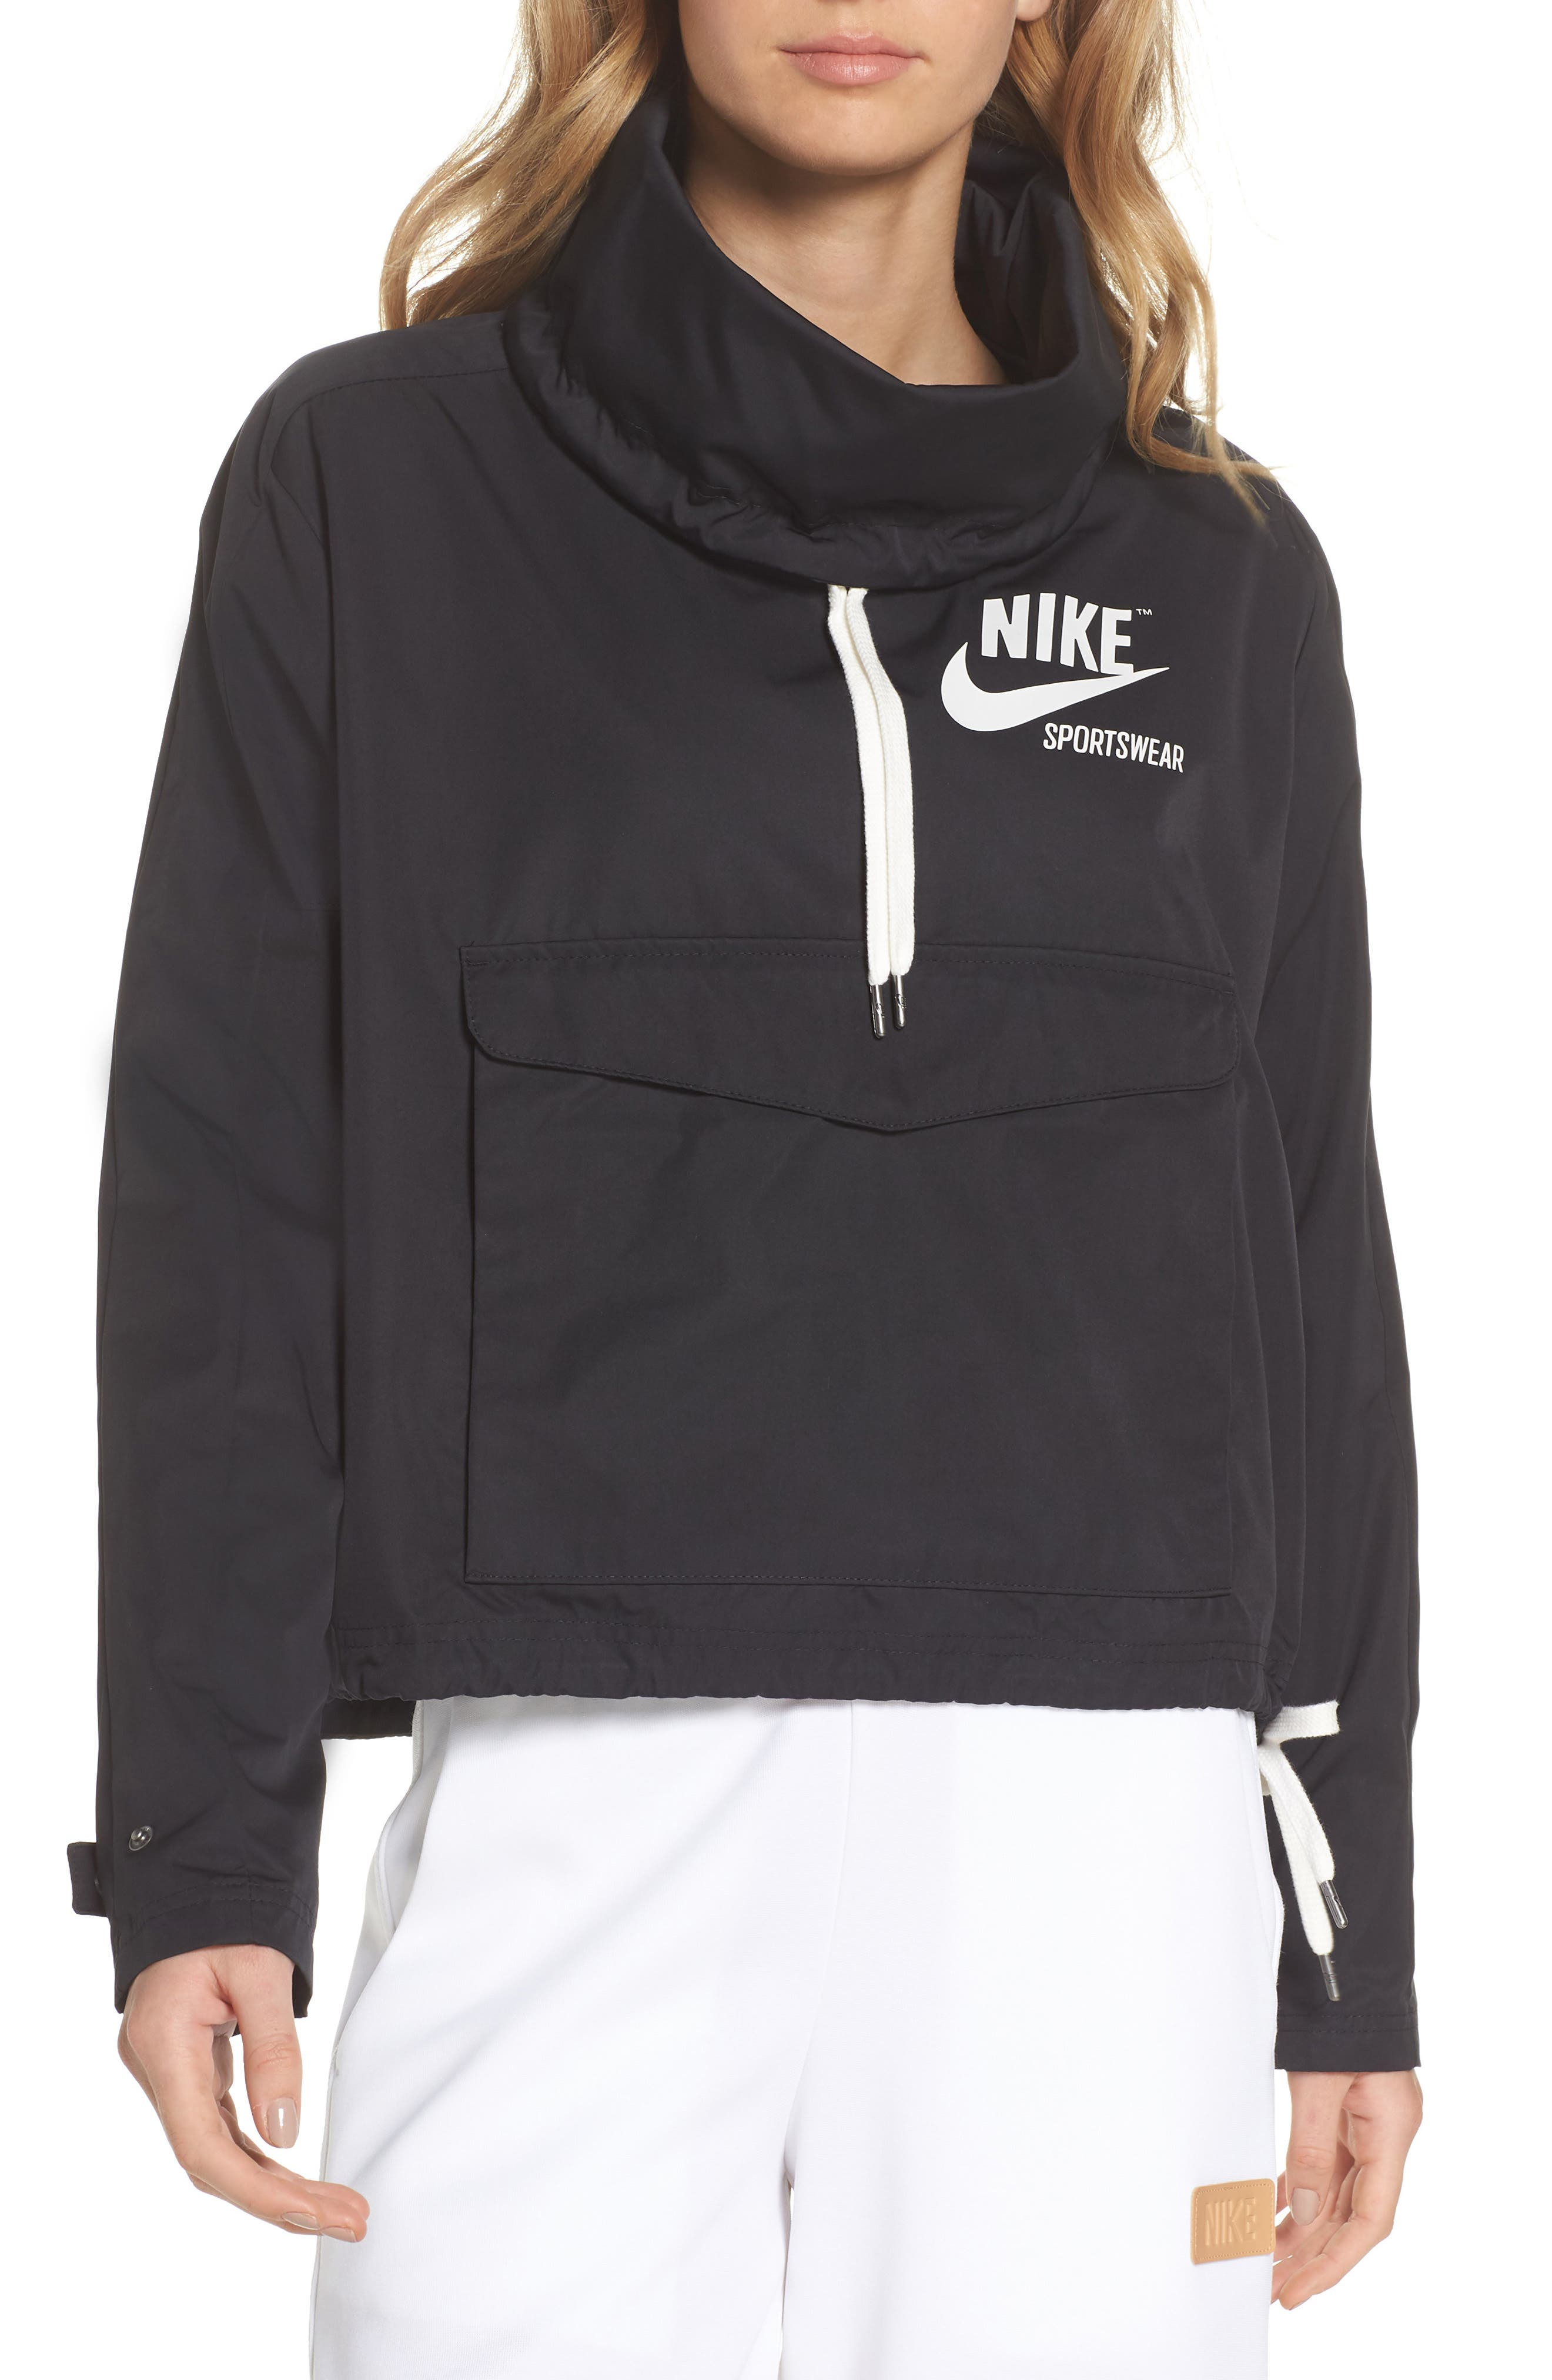 Sportswear Archive Jacket,                         Main,                         color, 010